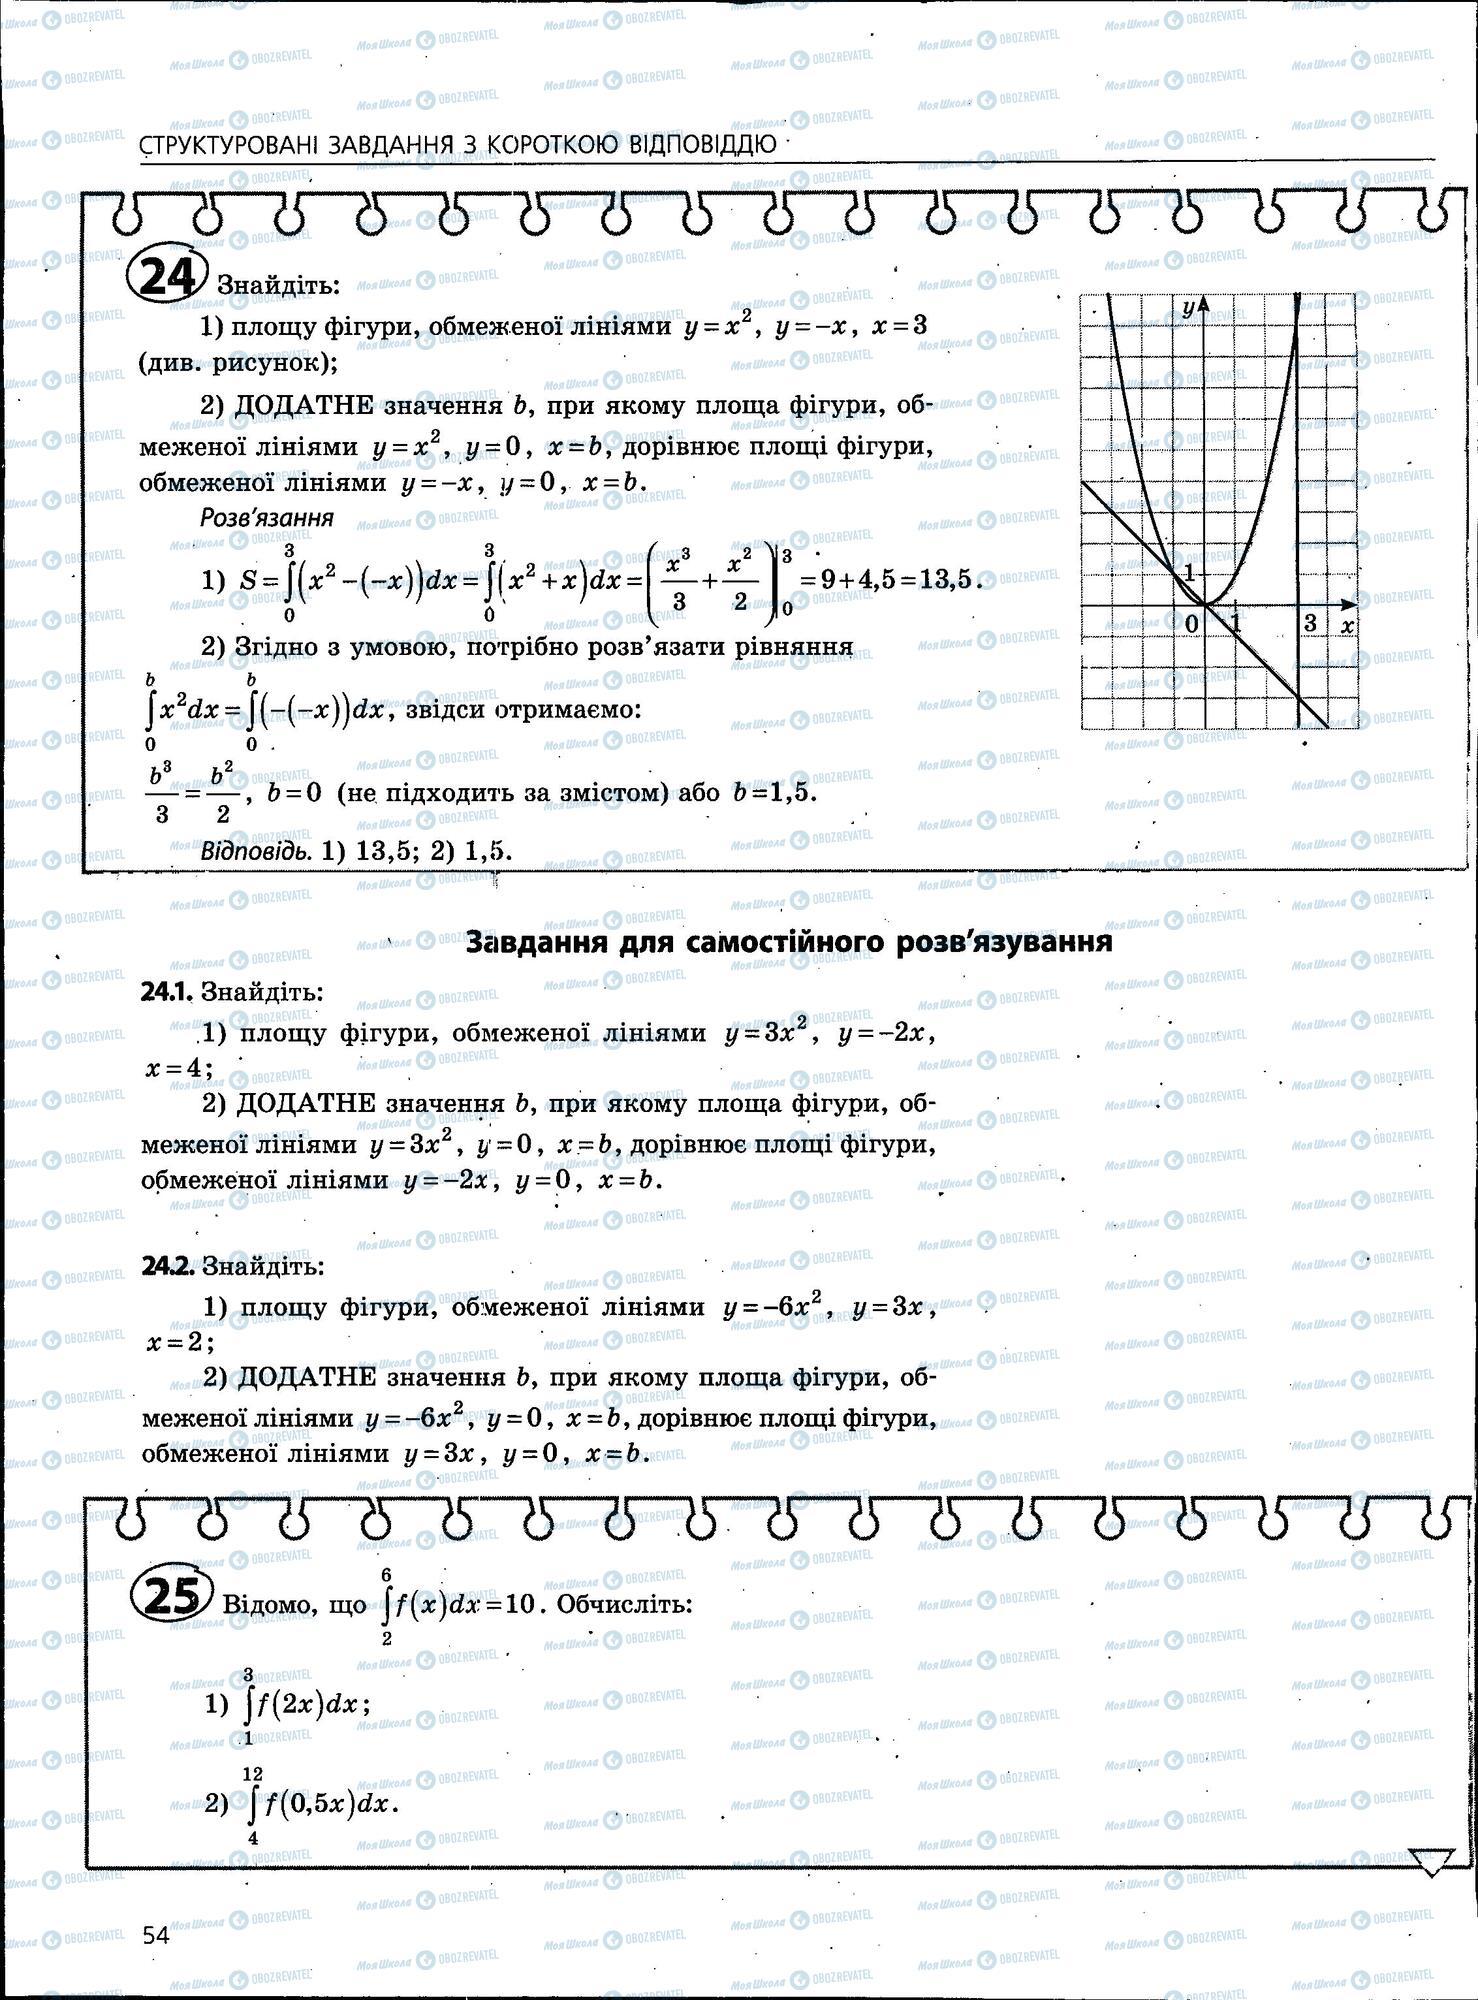 ЗНО Математика 11 класс страница 54